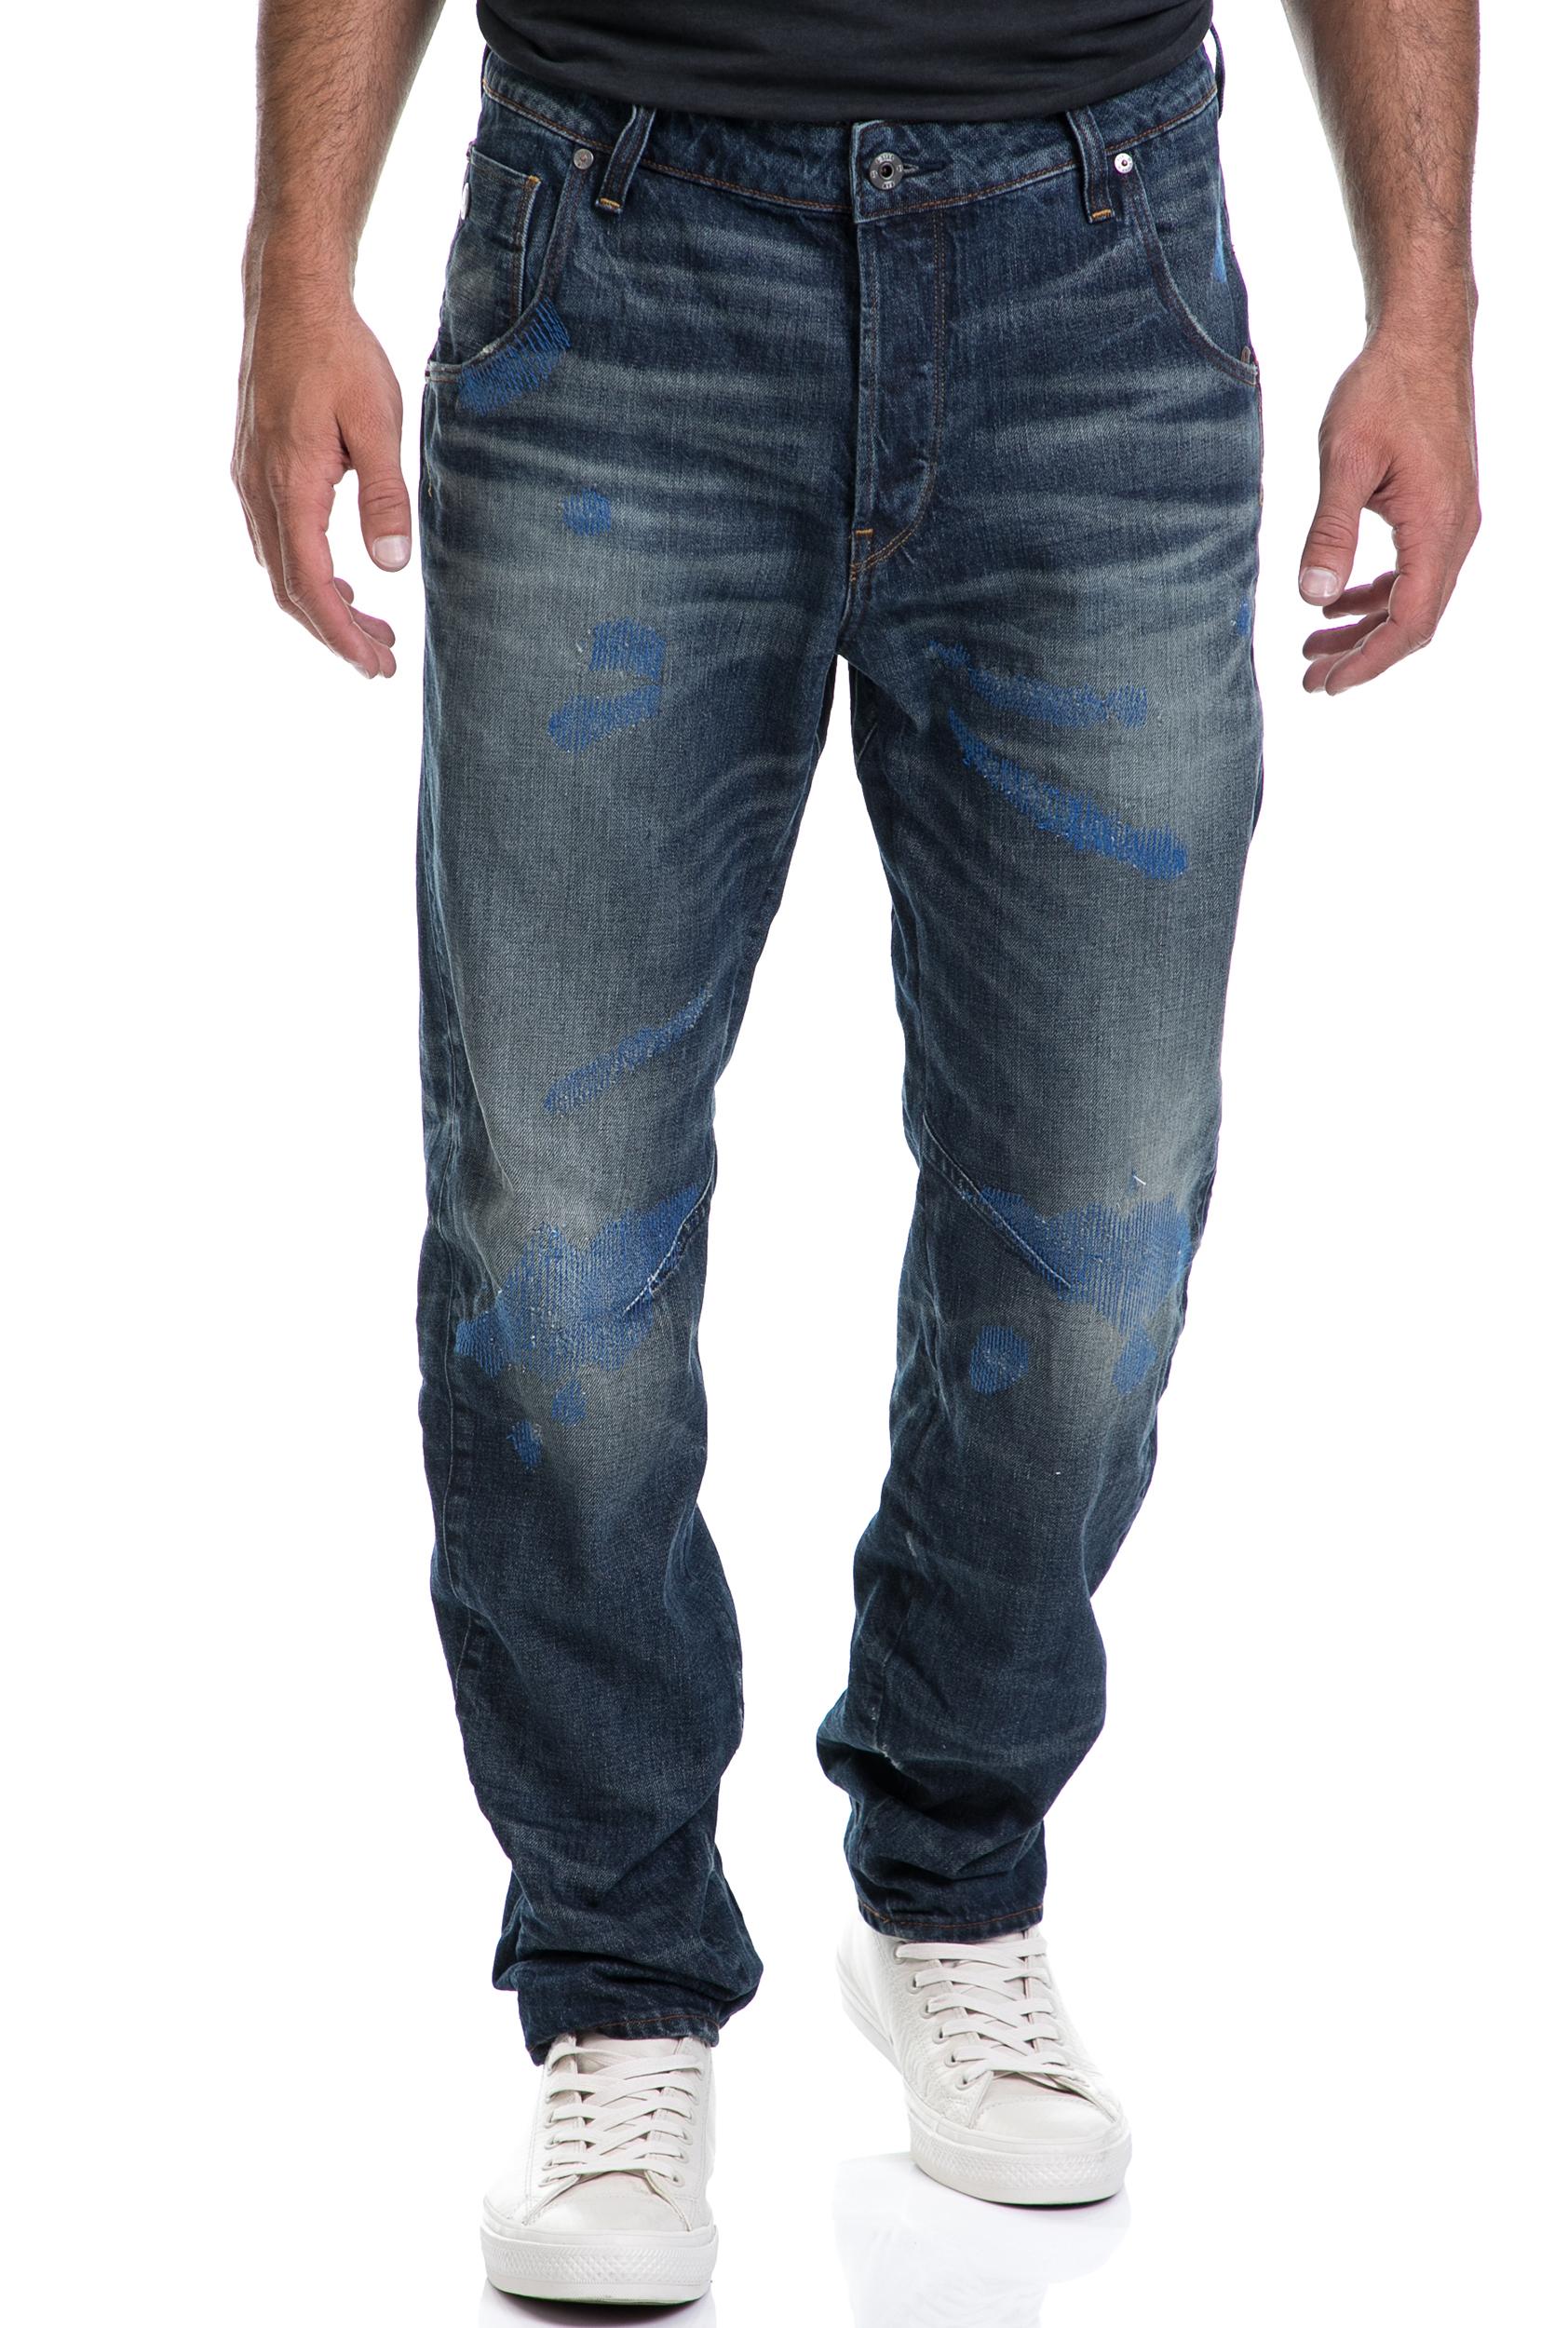 G-STAR RAW - Ανδρικό παντελόνι Arc 3D Tapered G-STAR RAW μπλε